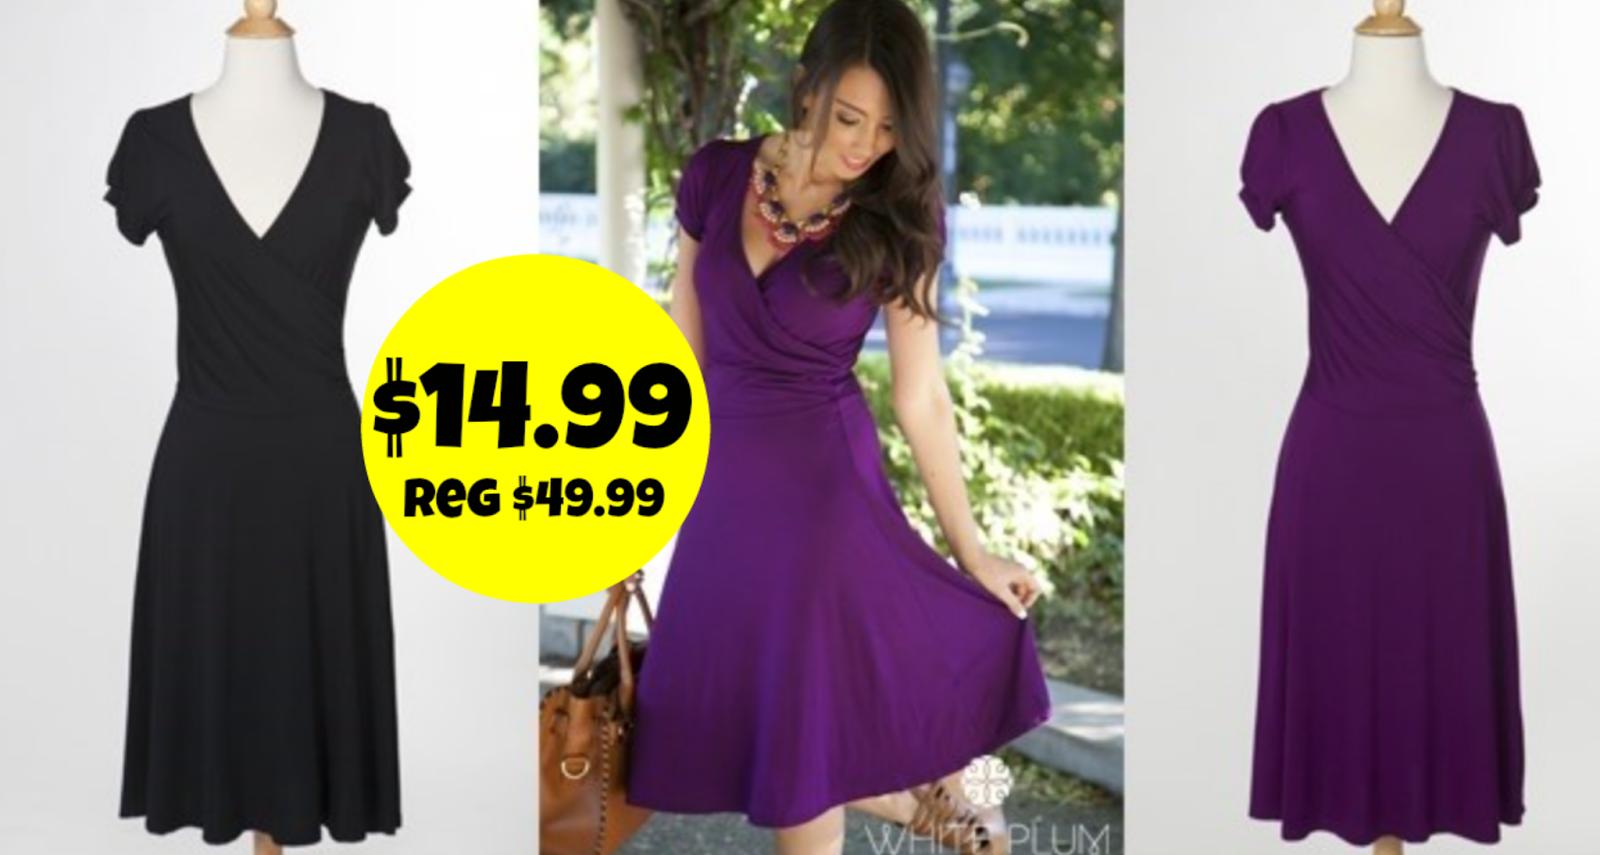 http://www.thebinderladies.com/2015/03/jane-com-vintage-inspired-midi-dresses.html#.VPSOBULduyM